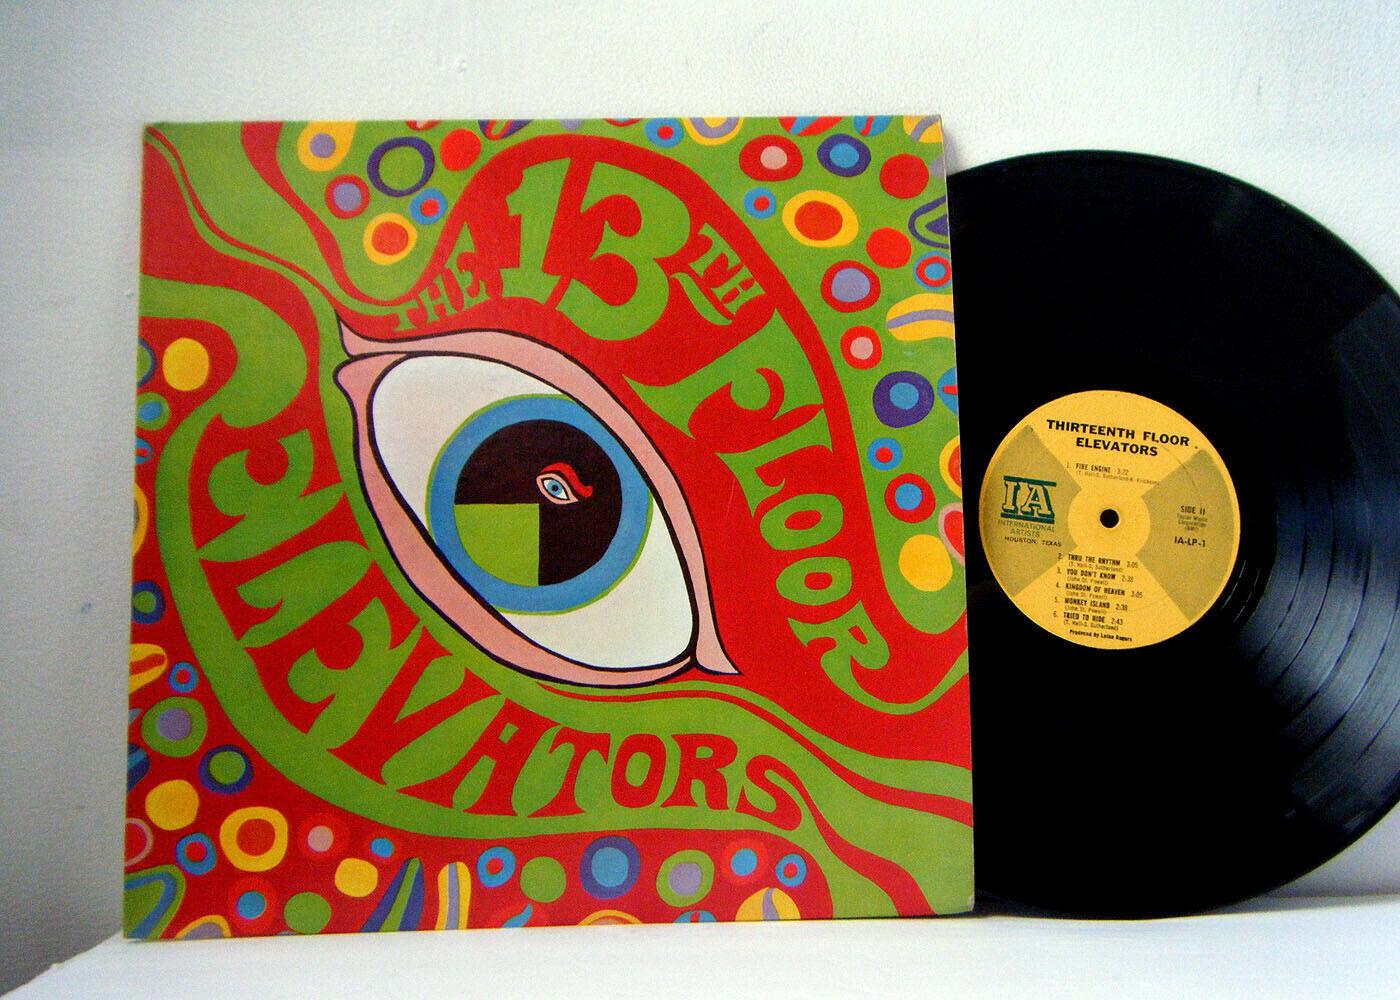 13TH FLOOR ELEVATORS  LP The Psychedelic Sounds Of  1966 IA original mono vinyl